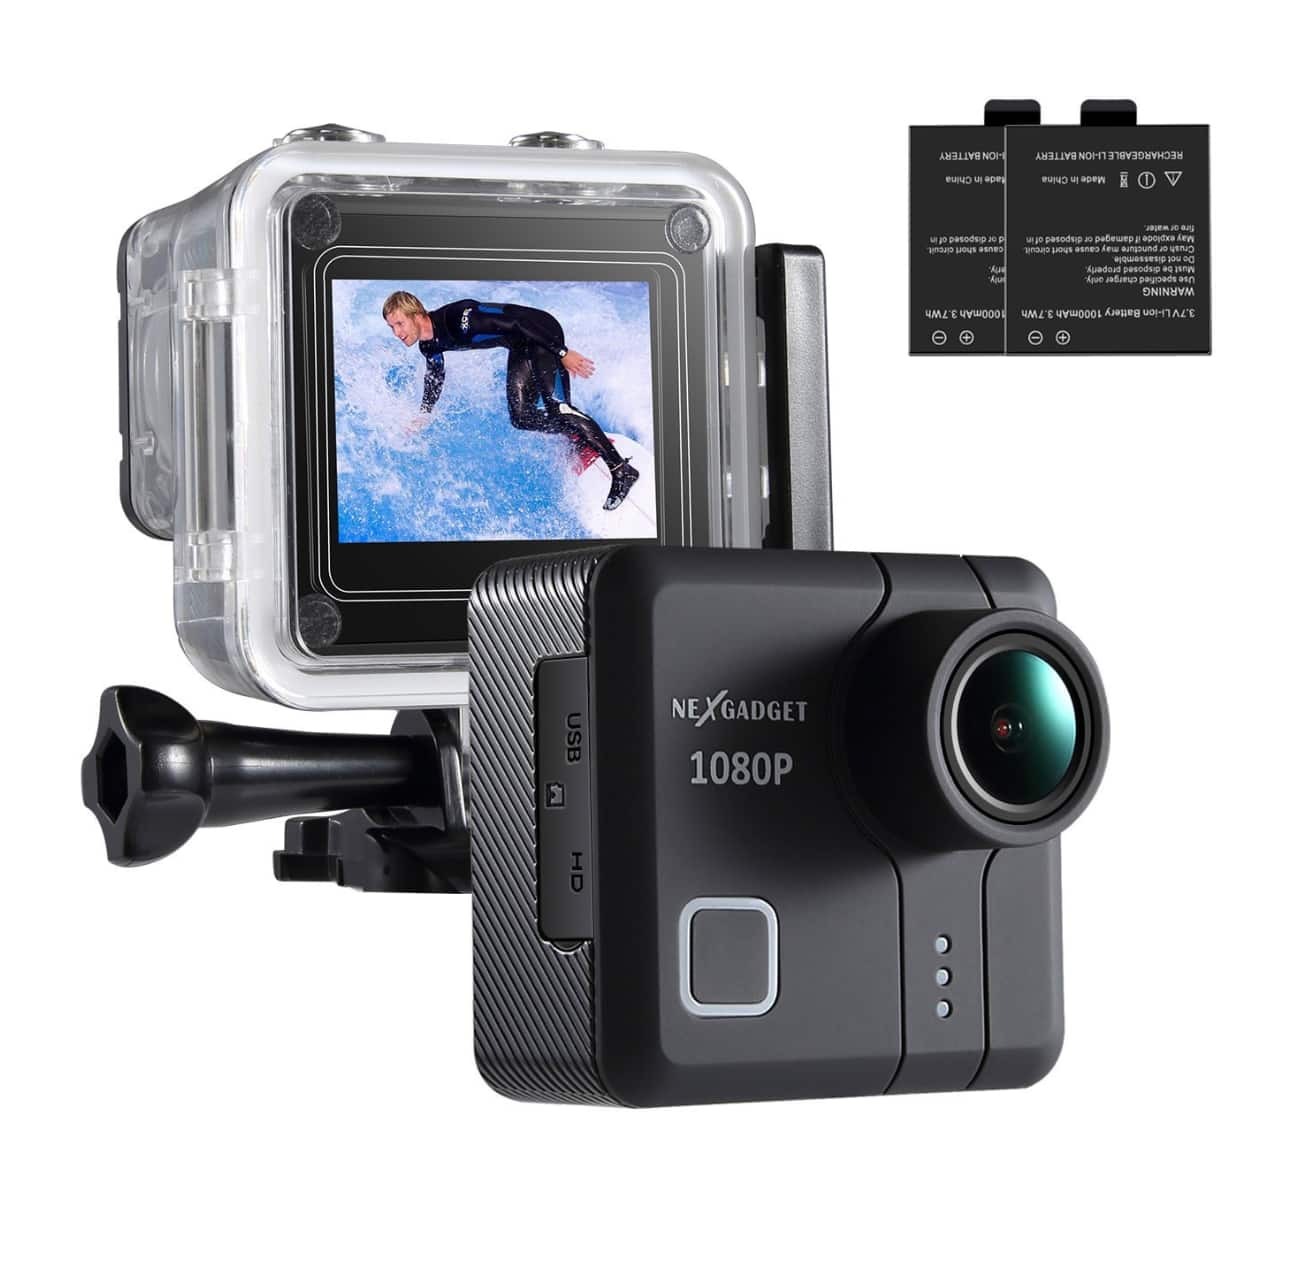 1080P 14MP Waterproof Action Camera $22.99 + 2 batteries $22.99 AC FS w/Amazon Prime